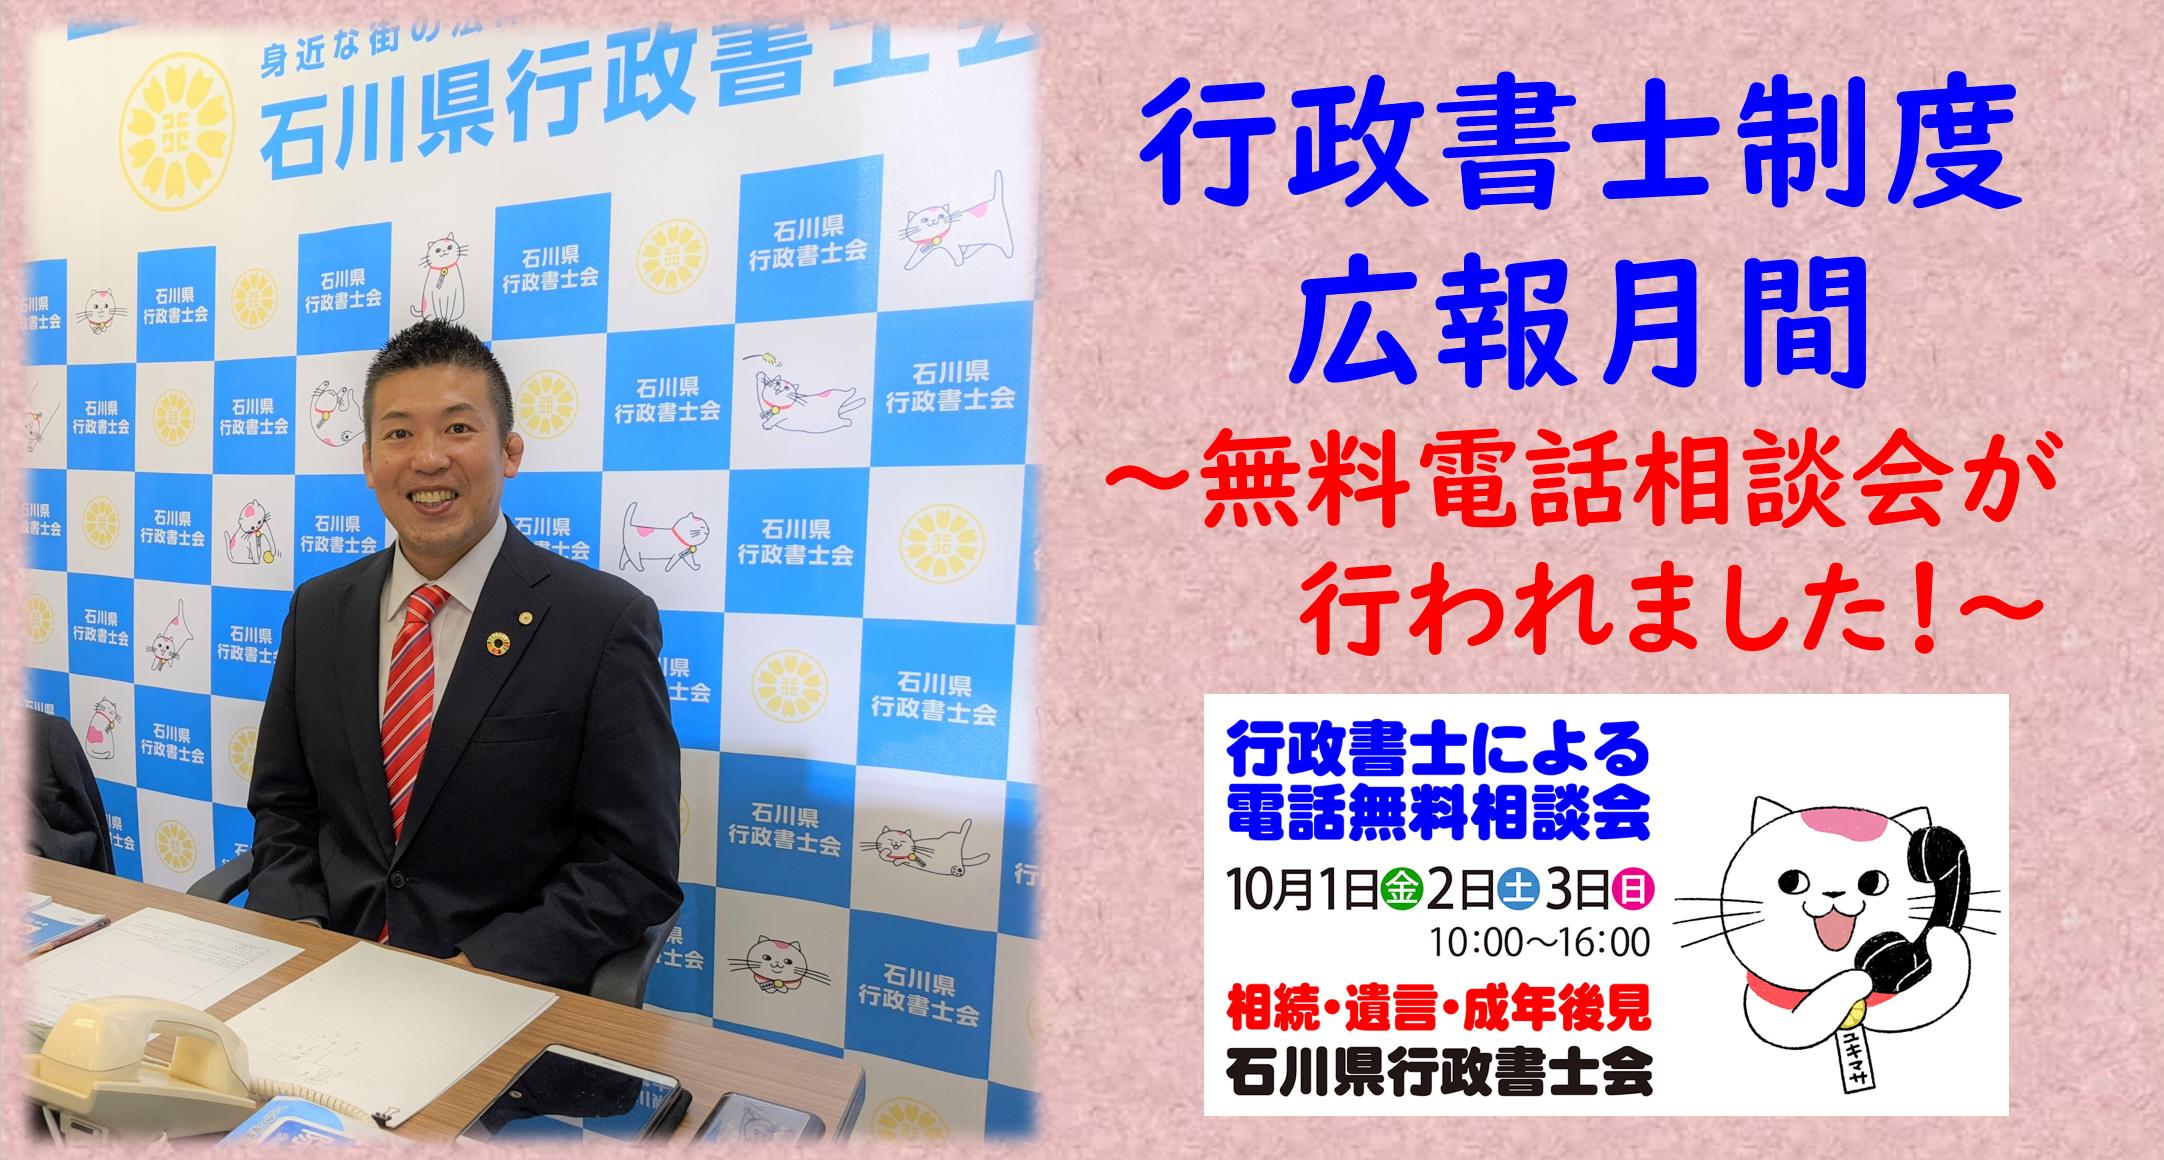 サムネ 石川県行政書士会 電話相談